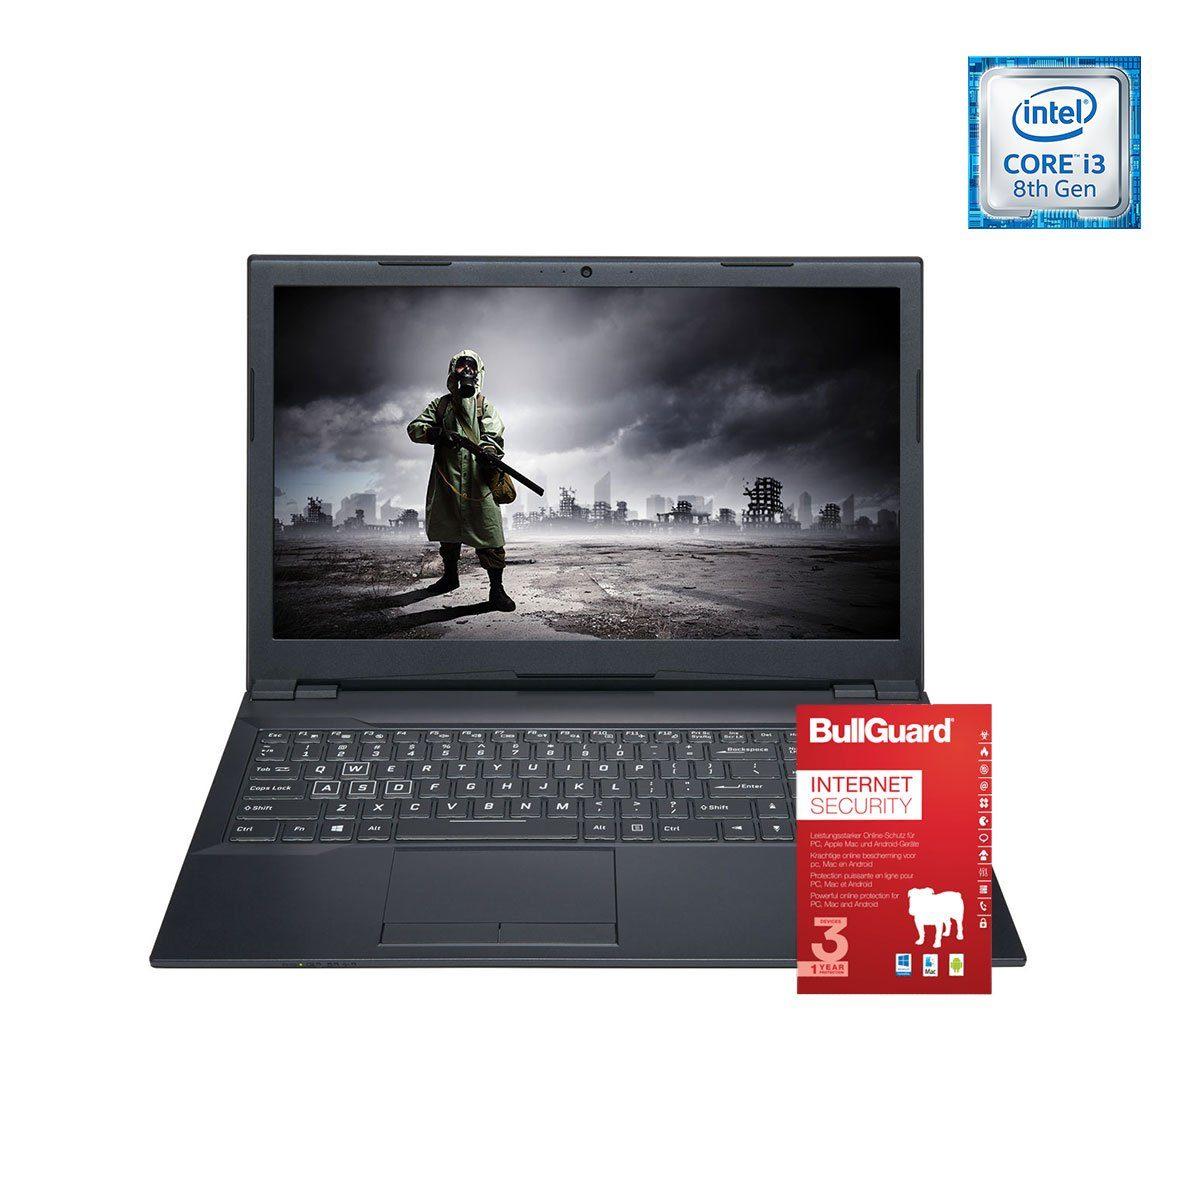 ONE GAMING Notebook, Core i3-8100, GeForce MX150, 8GB DDR4 RAM »NB 44740«